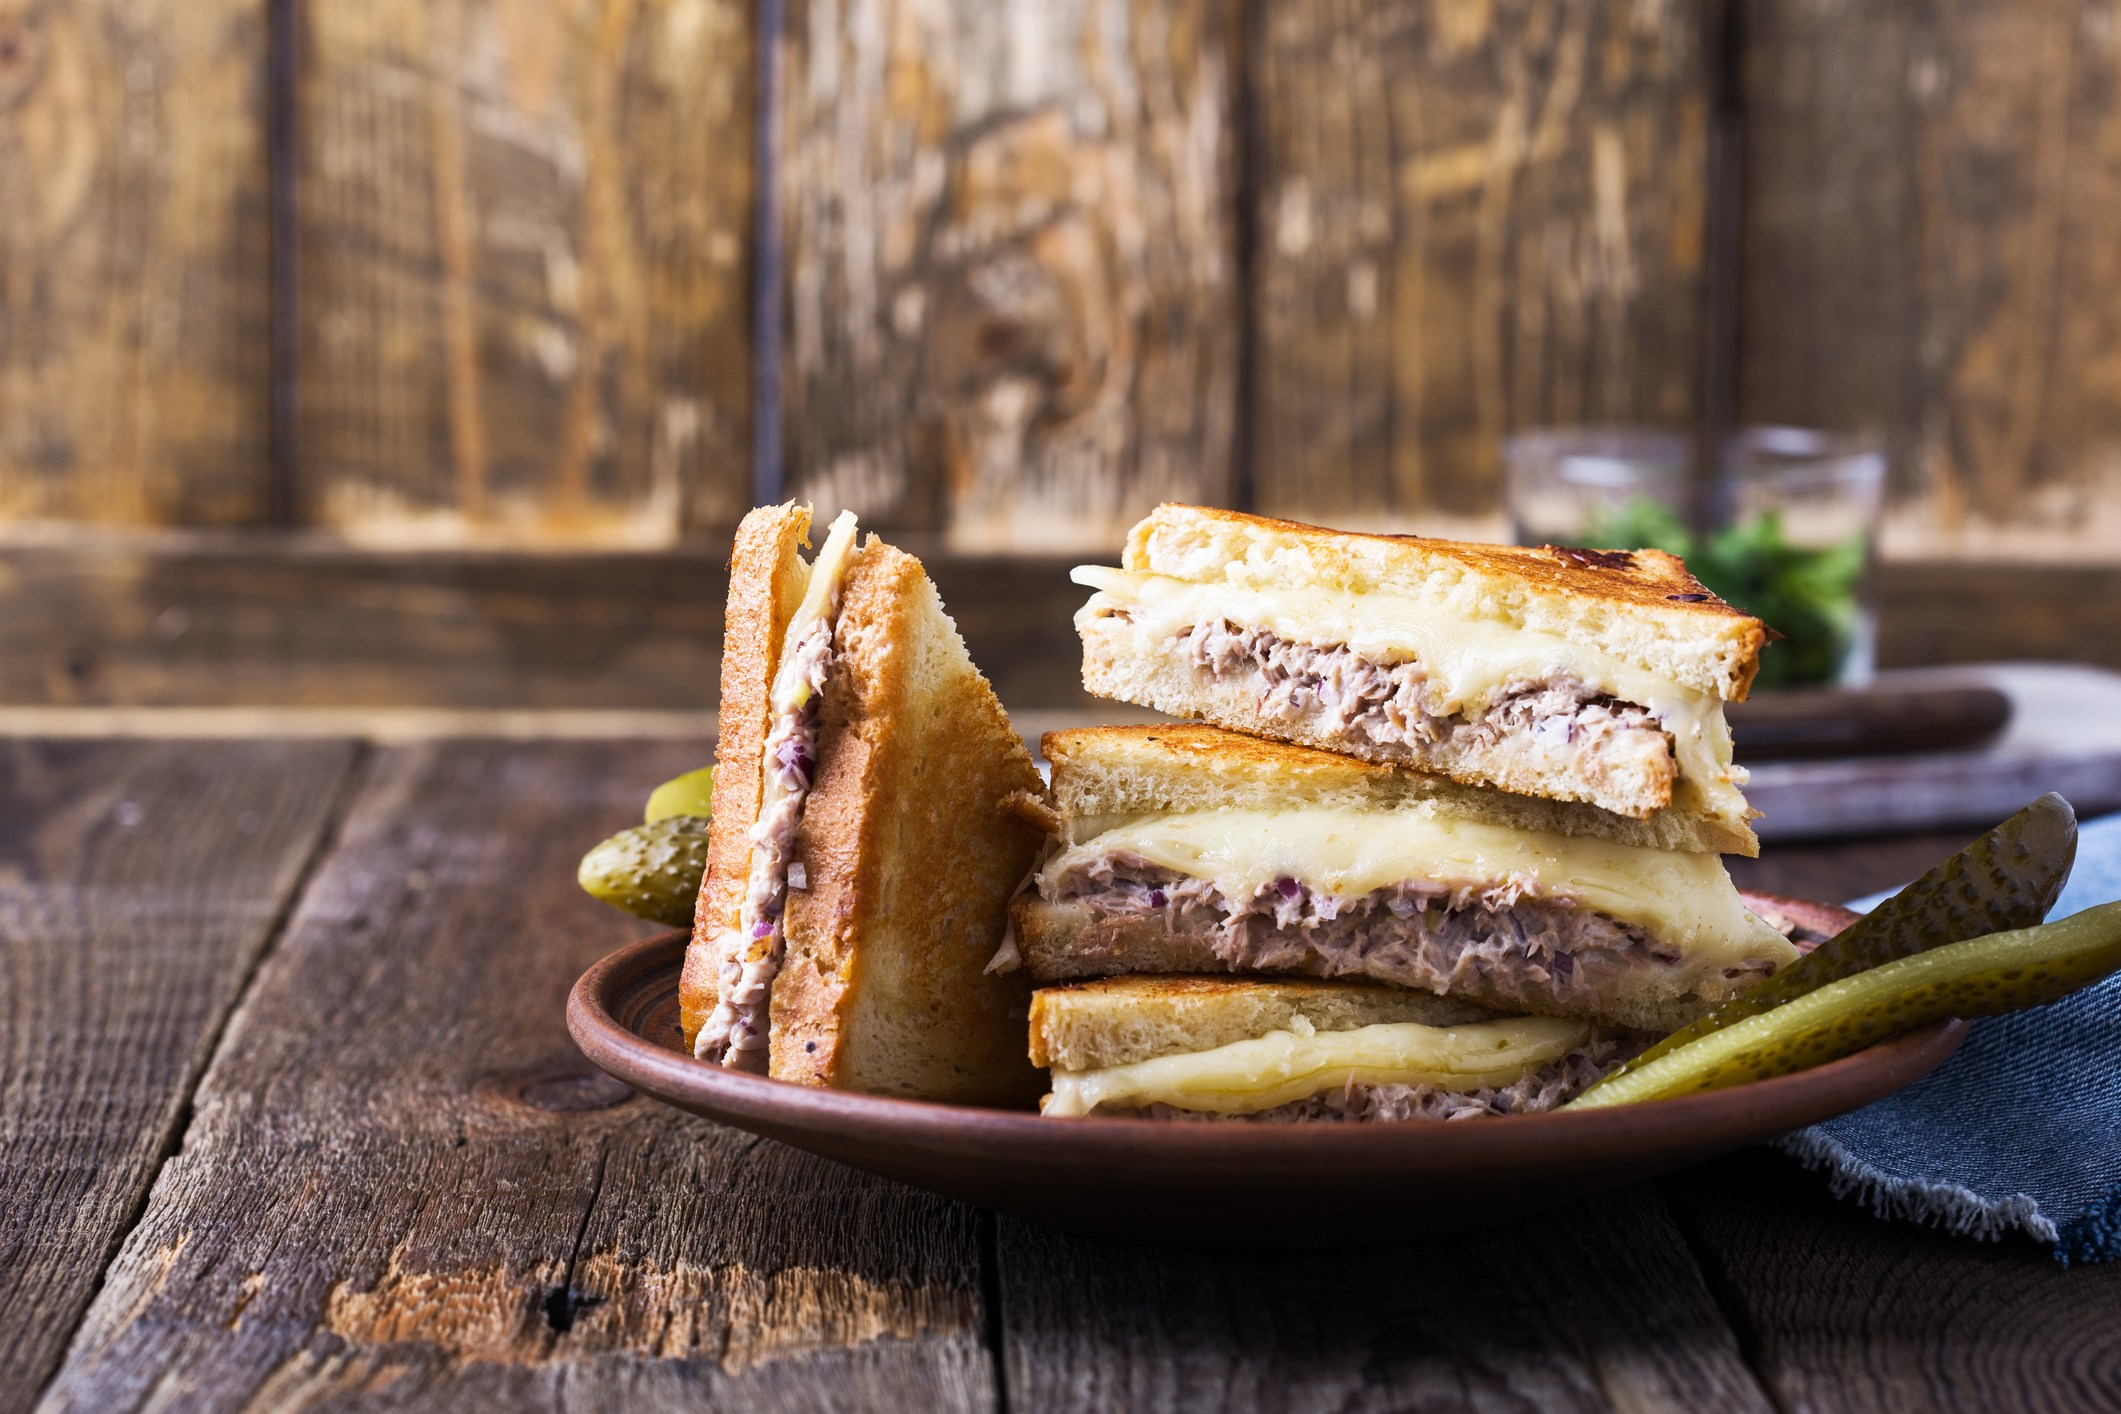 Homemade tuna melt sandwich on rural table